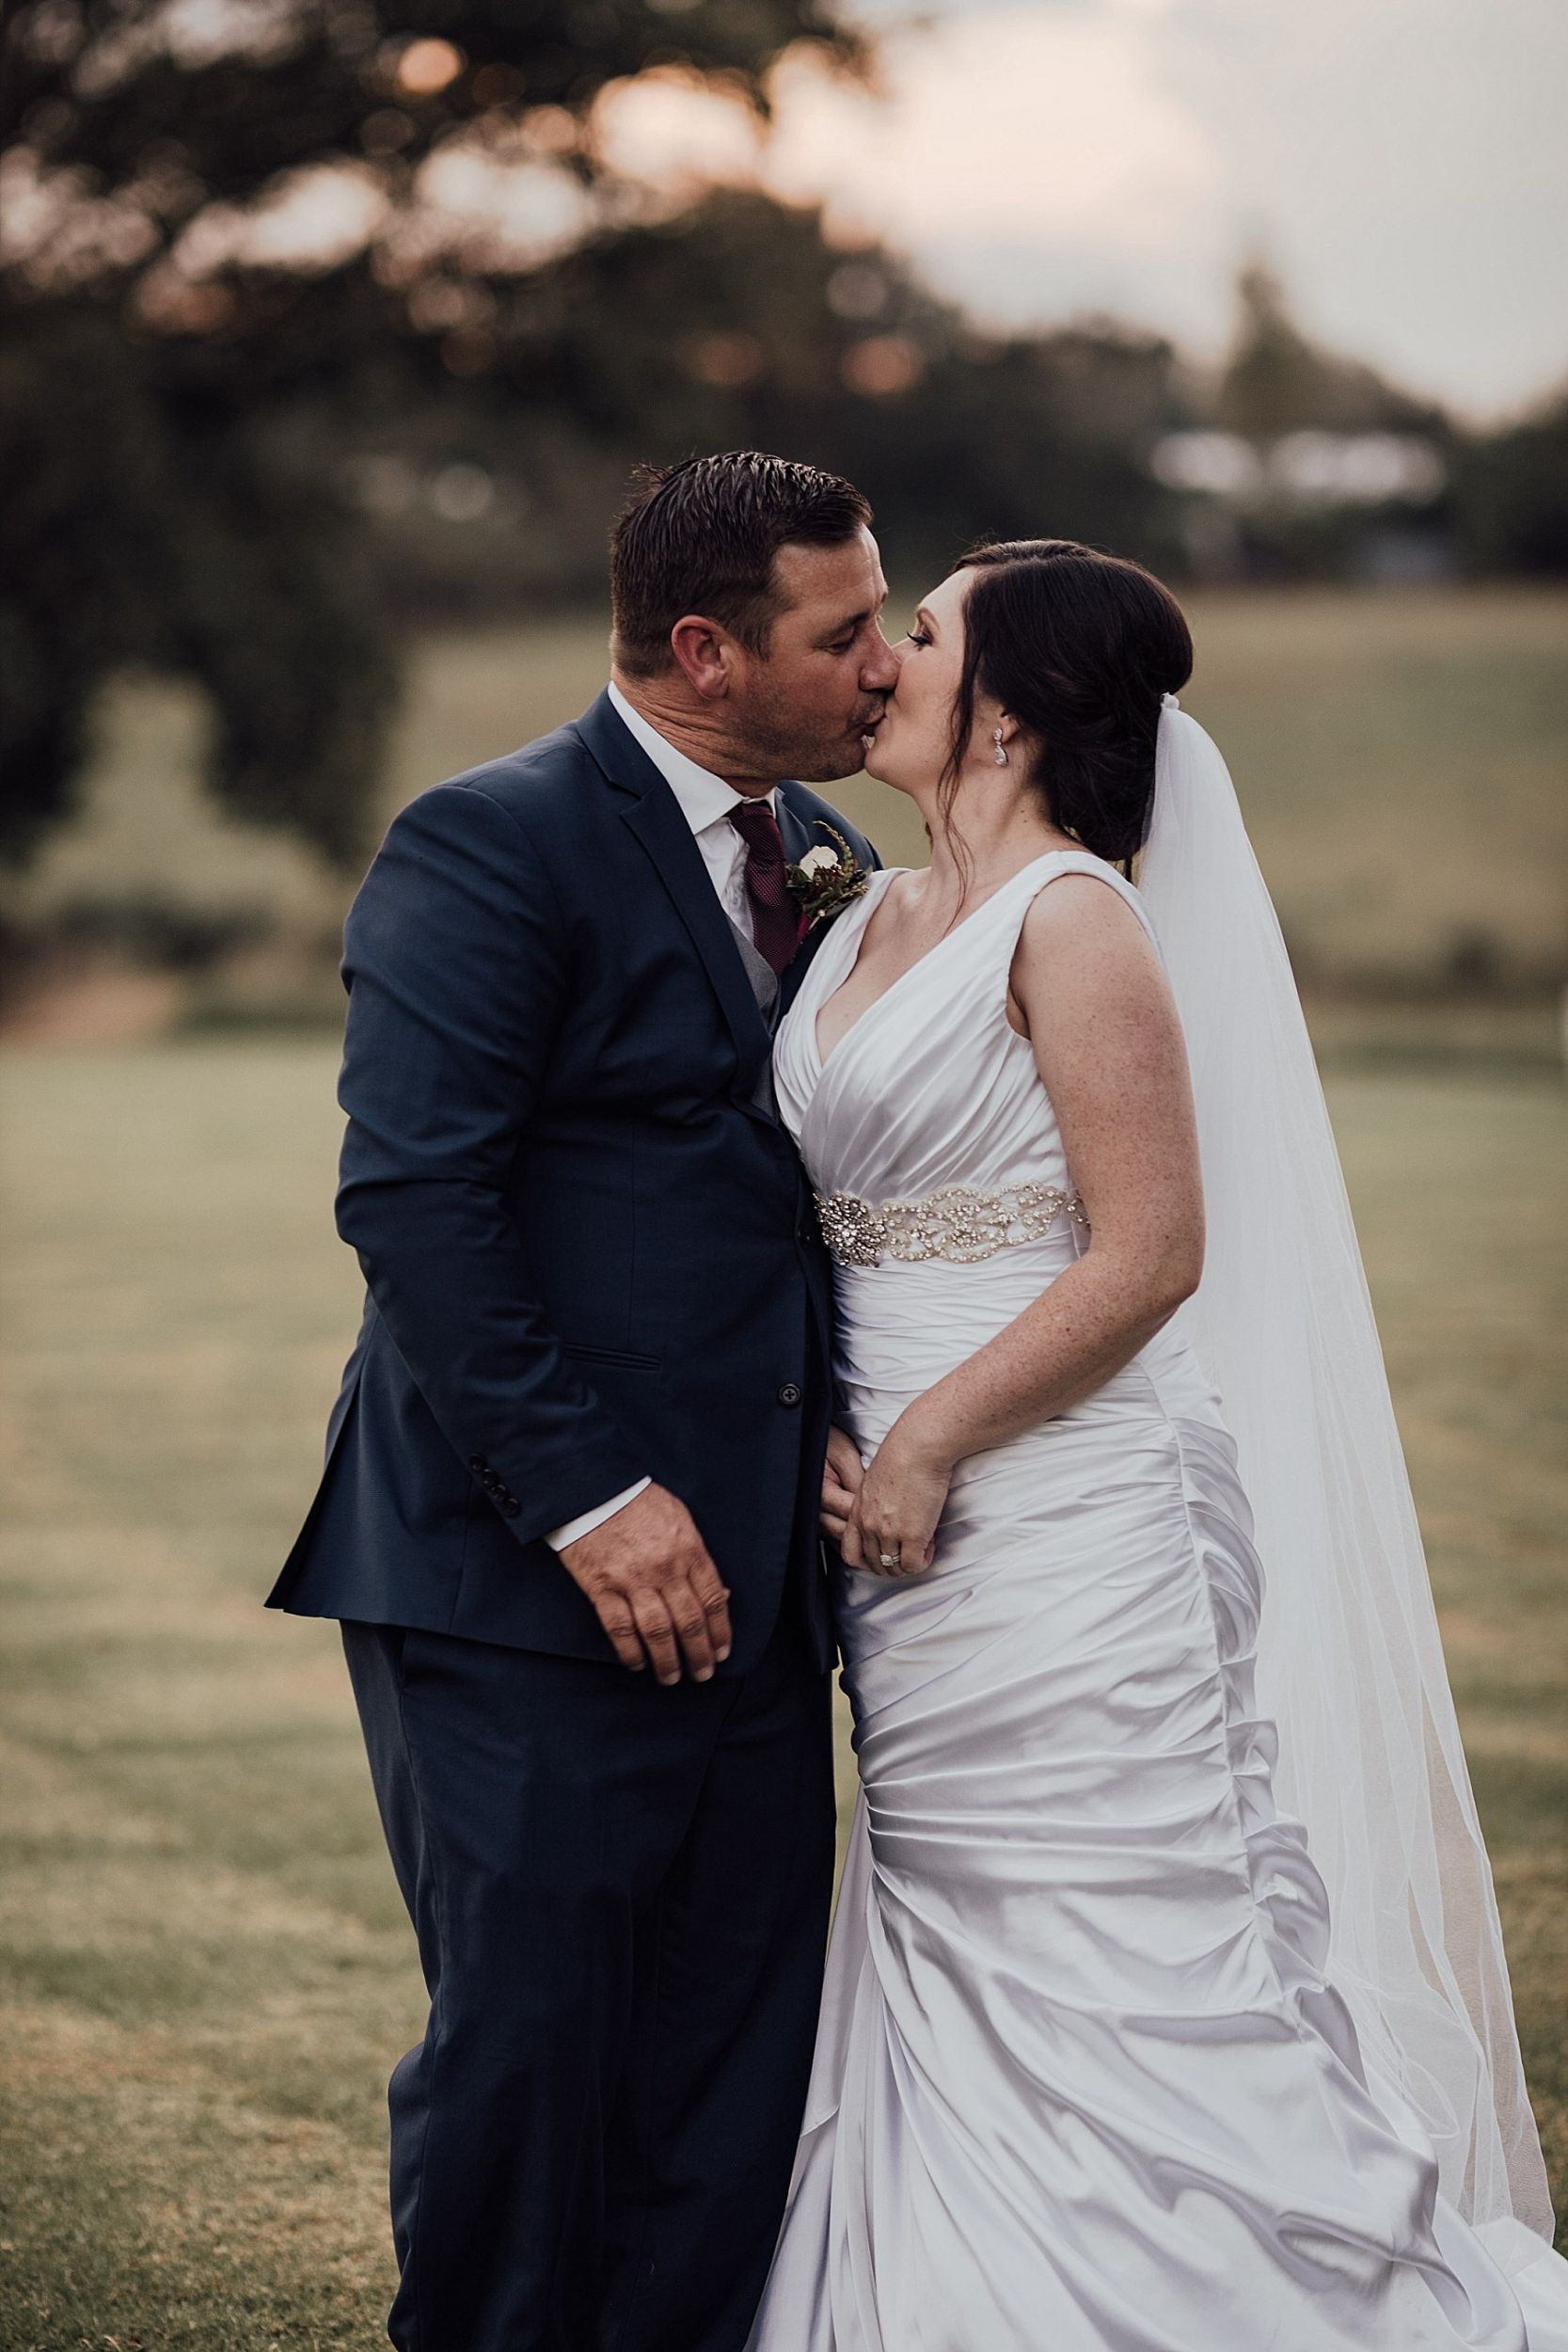 Allely Estate Wedding Auckland Wedding Photographer - Jana & Laurie_0208.jpg